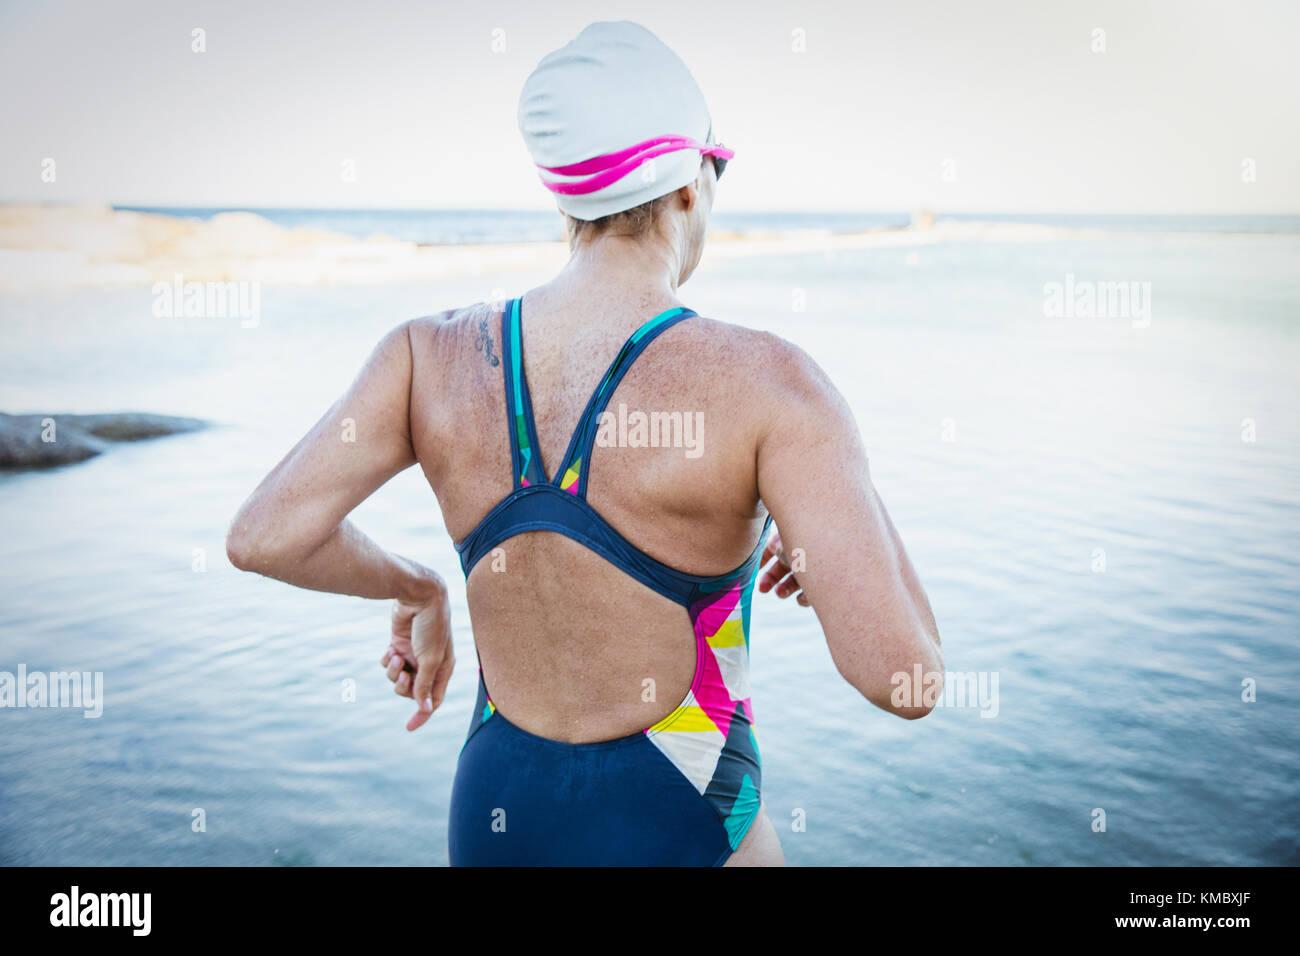 Female open water swimmer running into ocean - Stock Image